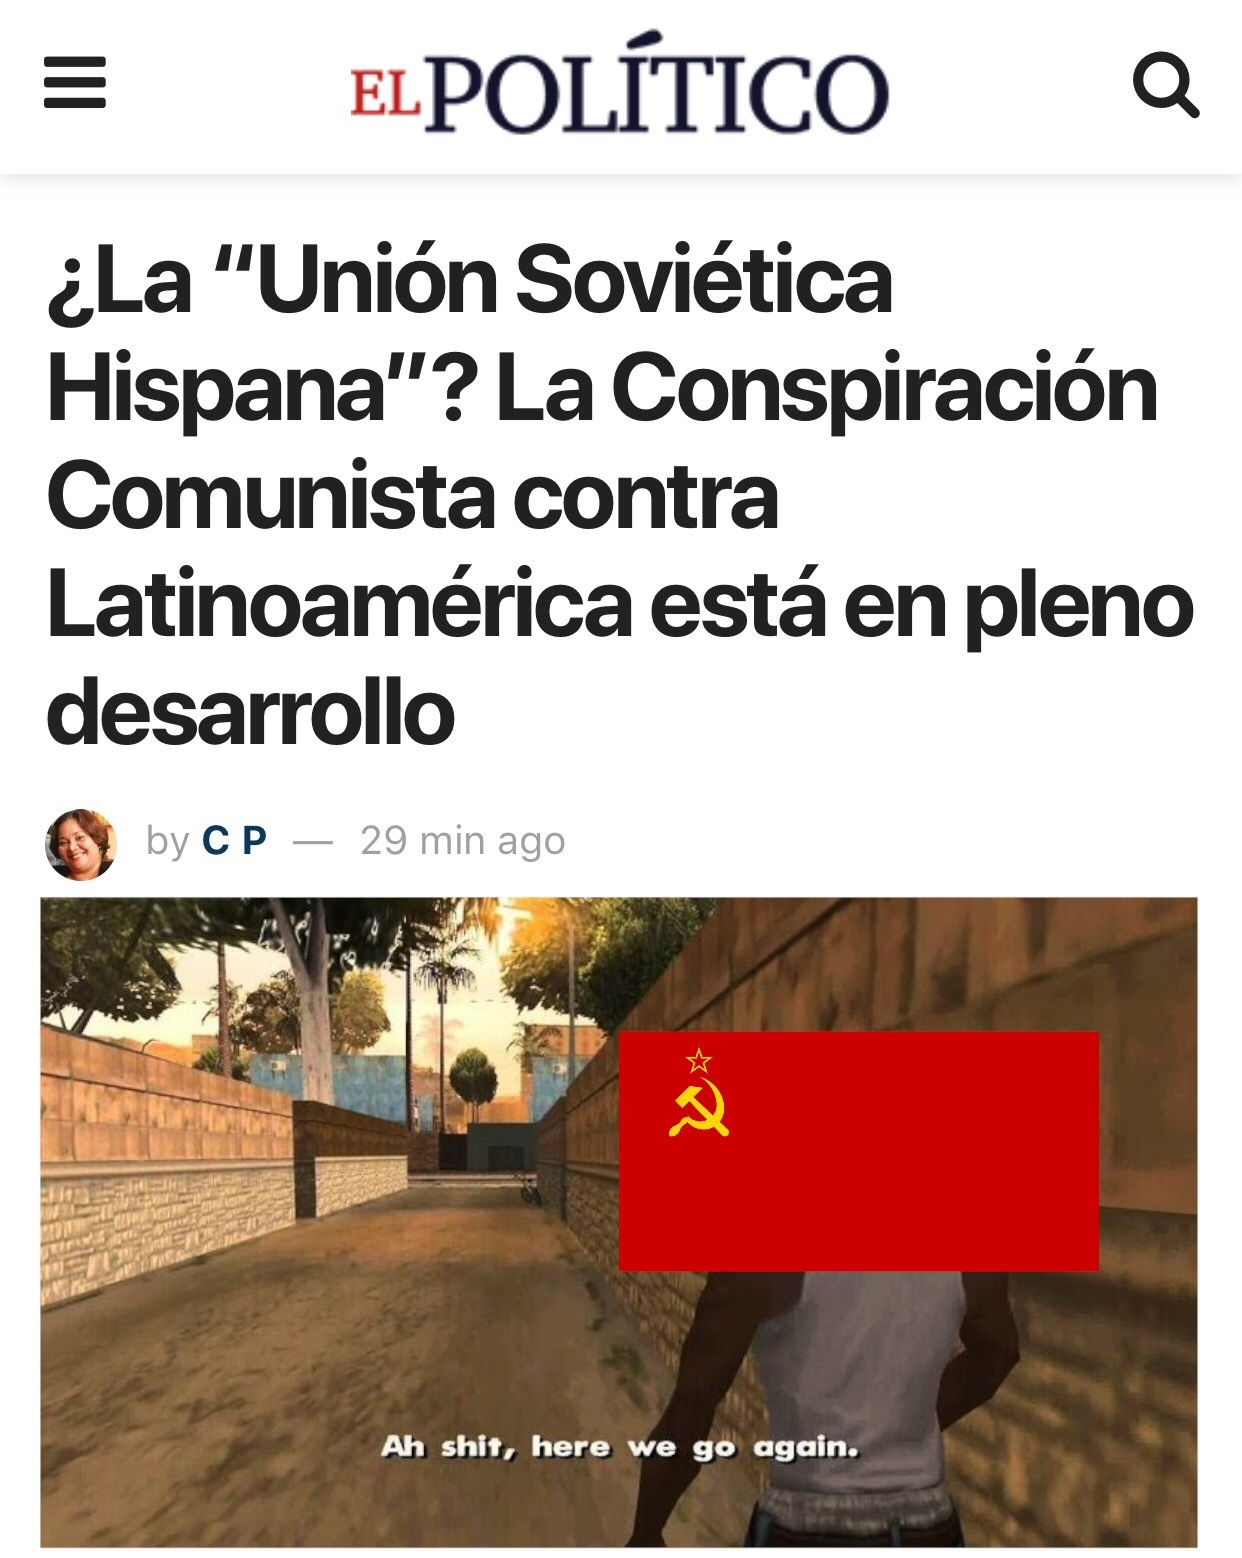 Unión Soviética Latinoaméricana - meme